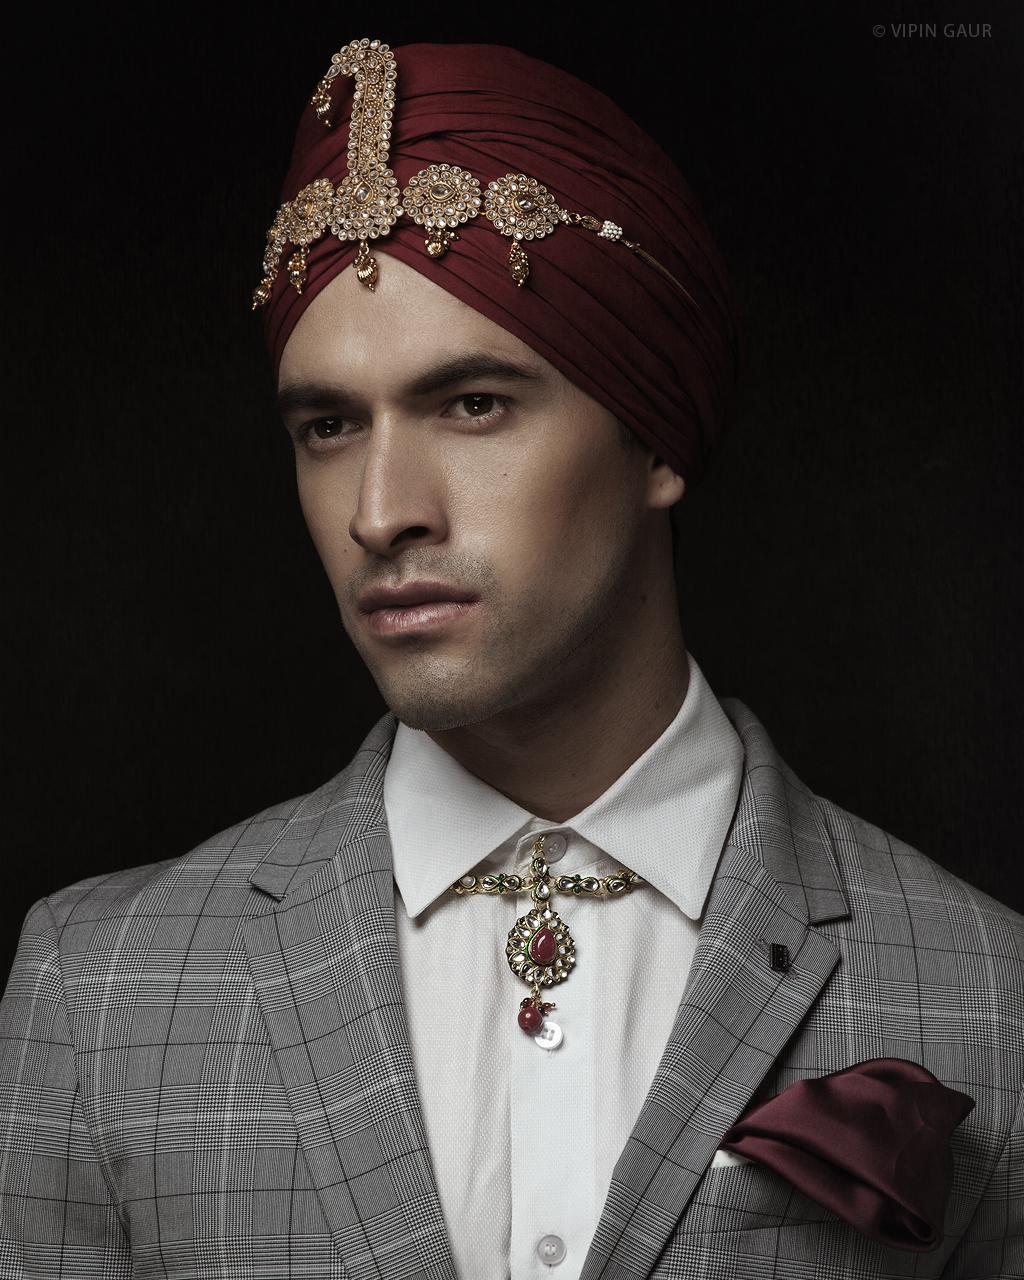 Jewellery Photography by Vipin Gaur